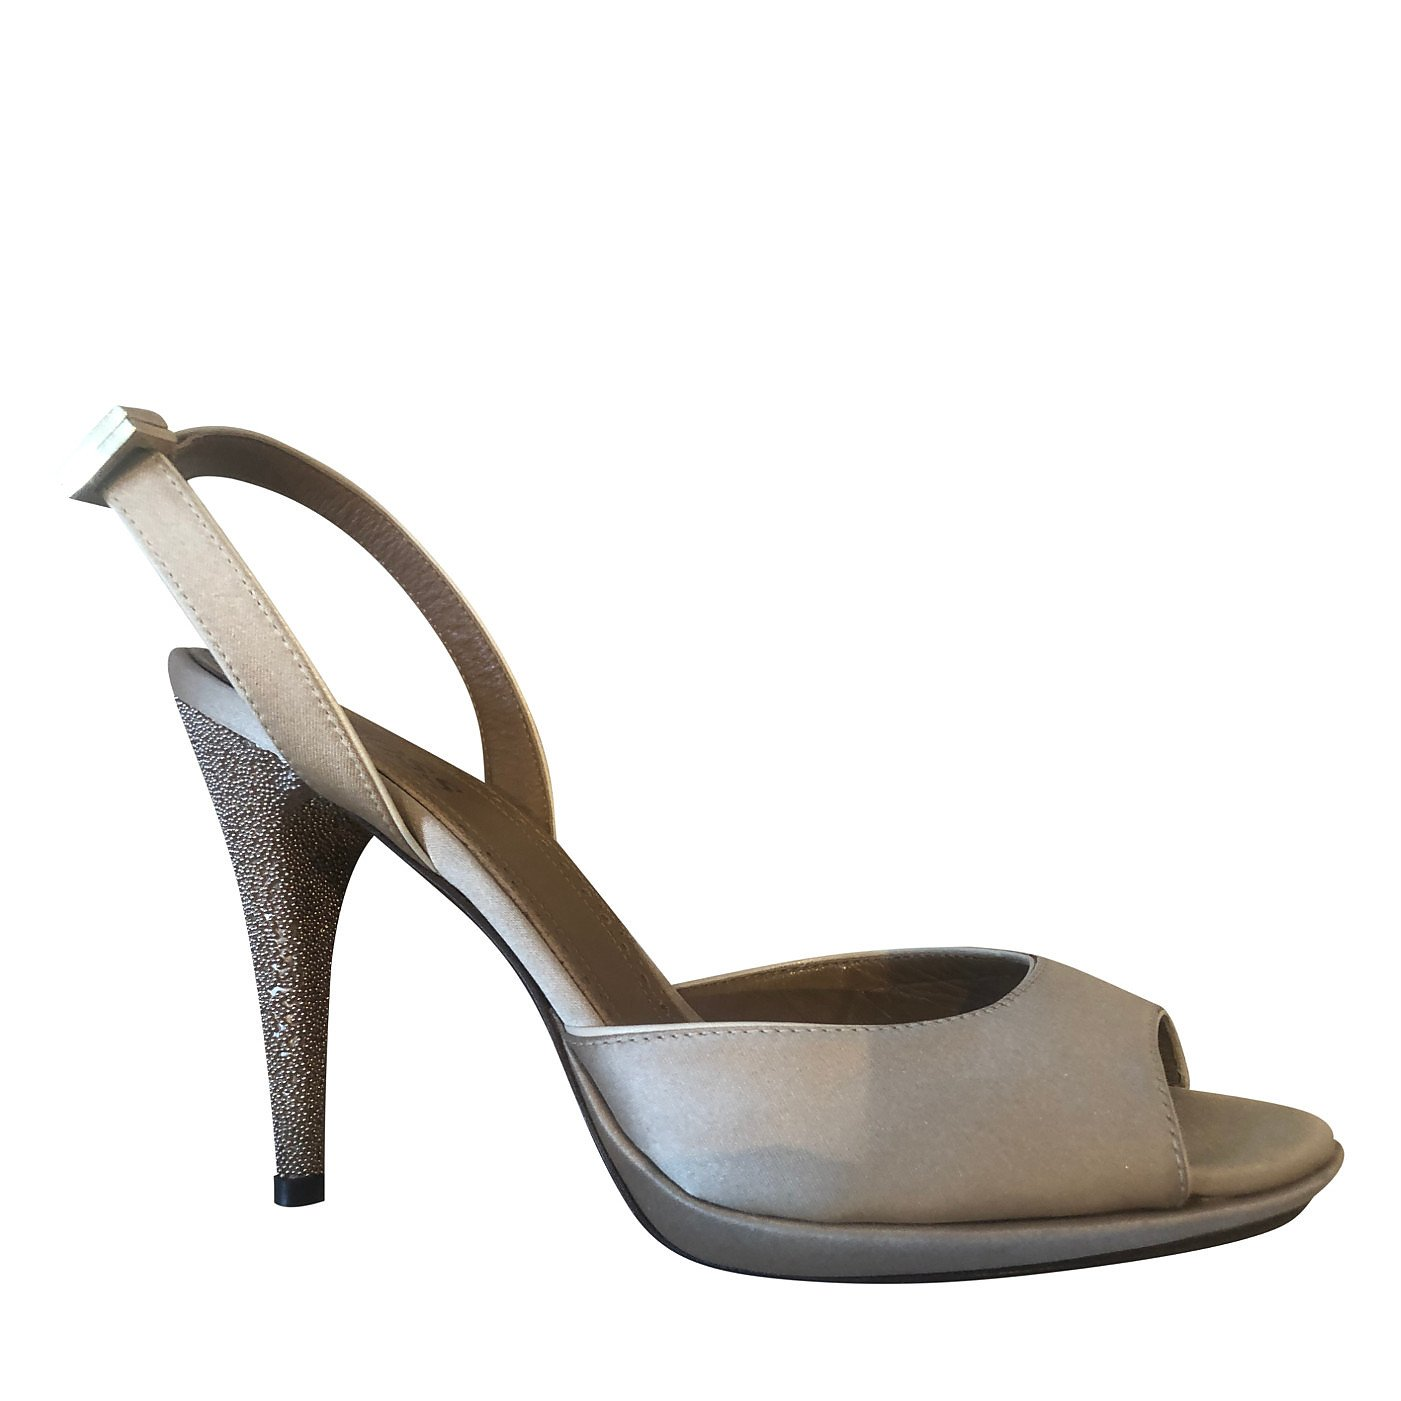 HUGO BOSS Satin Stiletto Pumps With Jewelled Heel